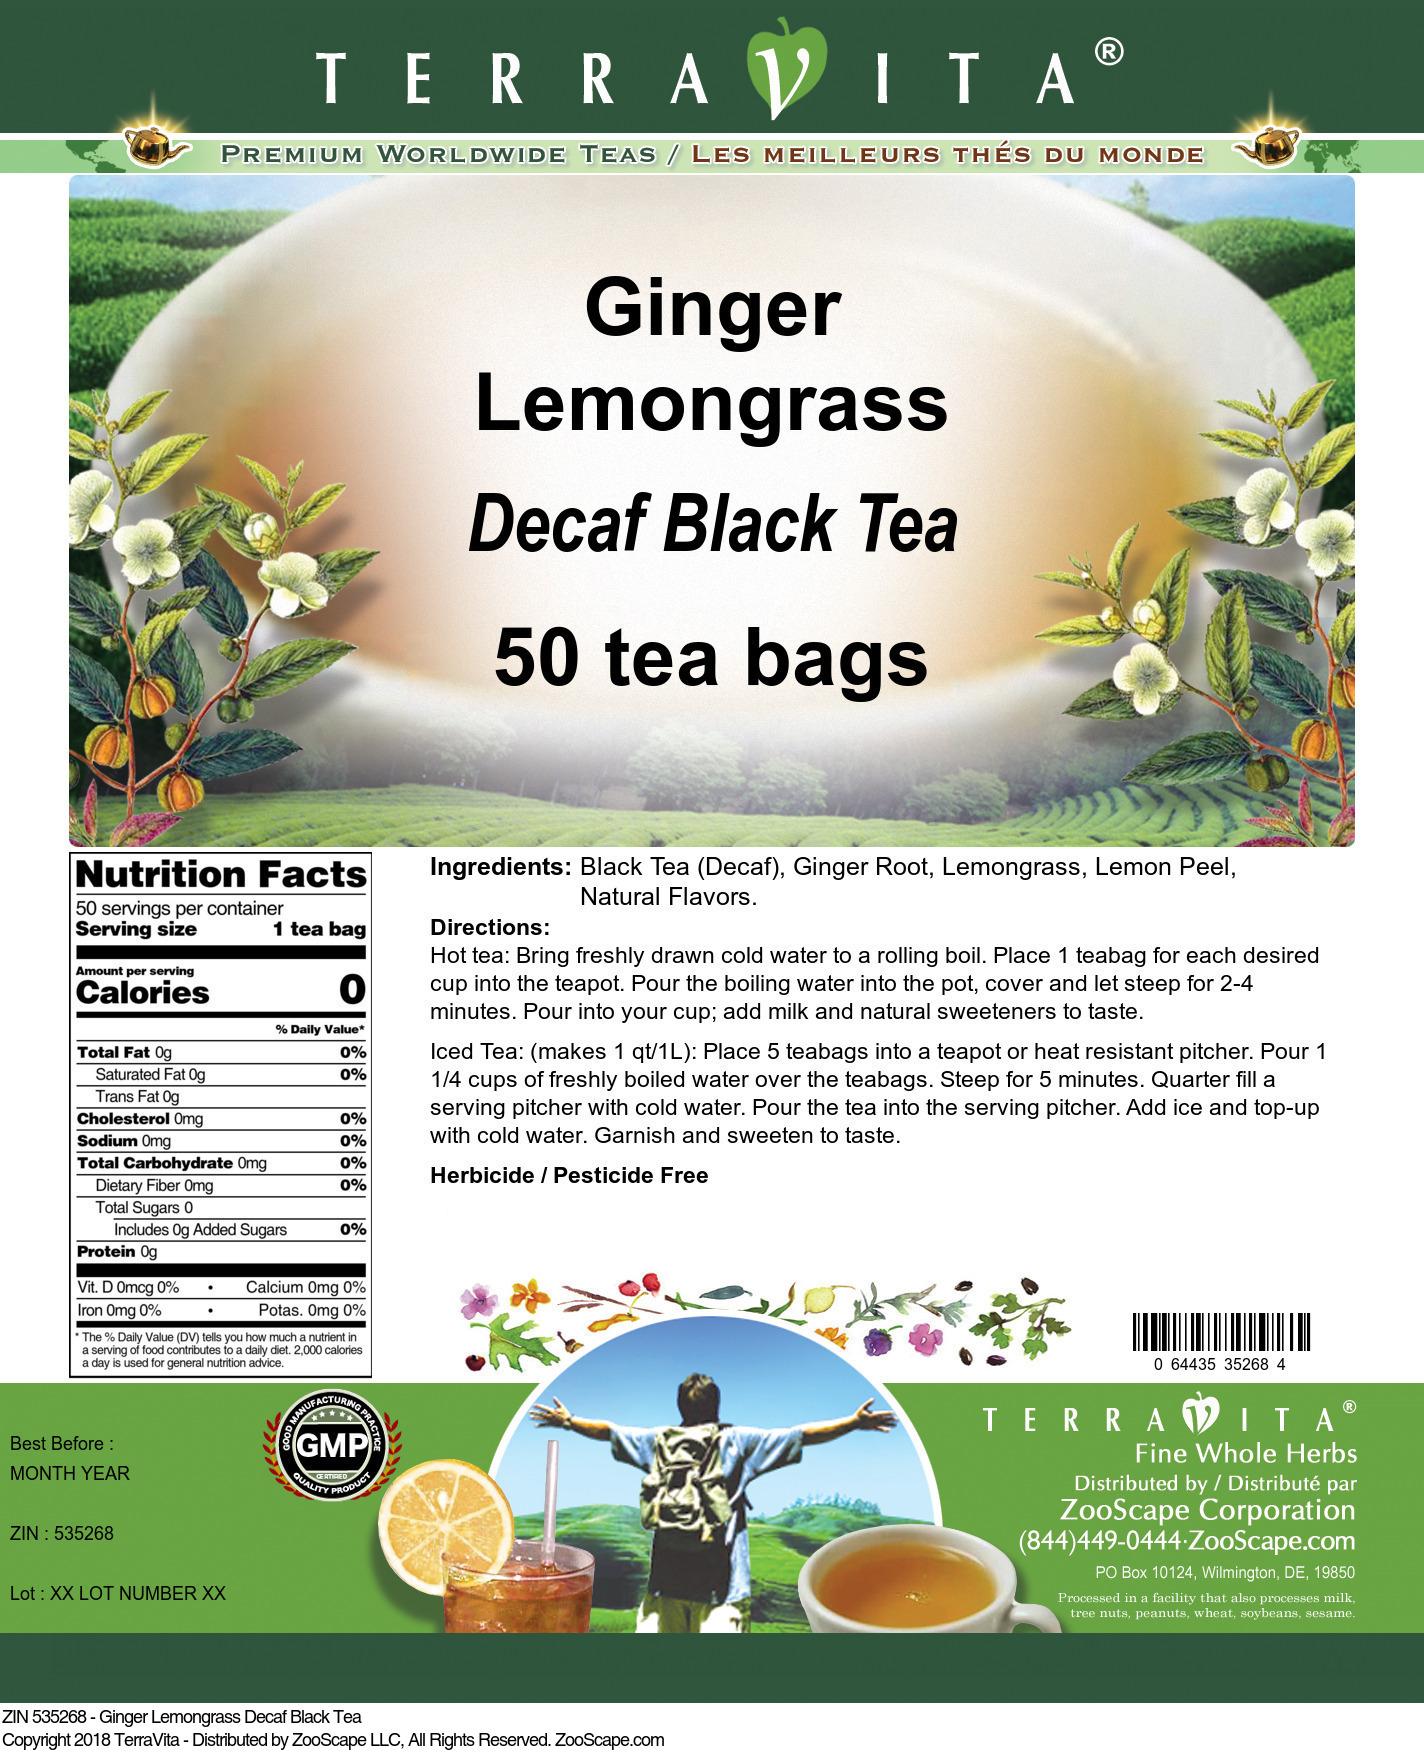 Ginger Lemongrass Decaf Black Tea